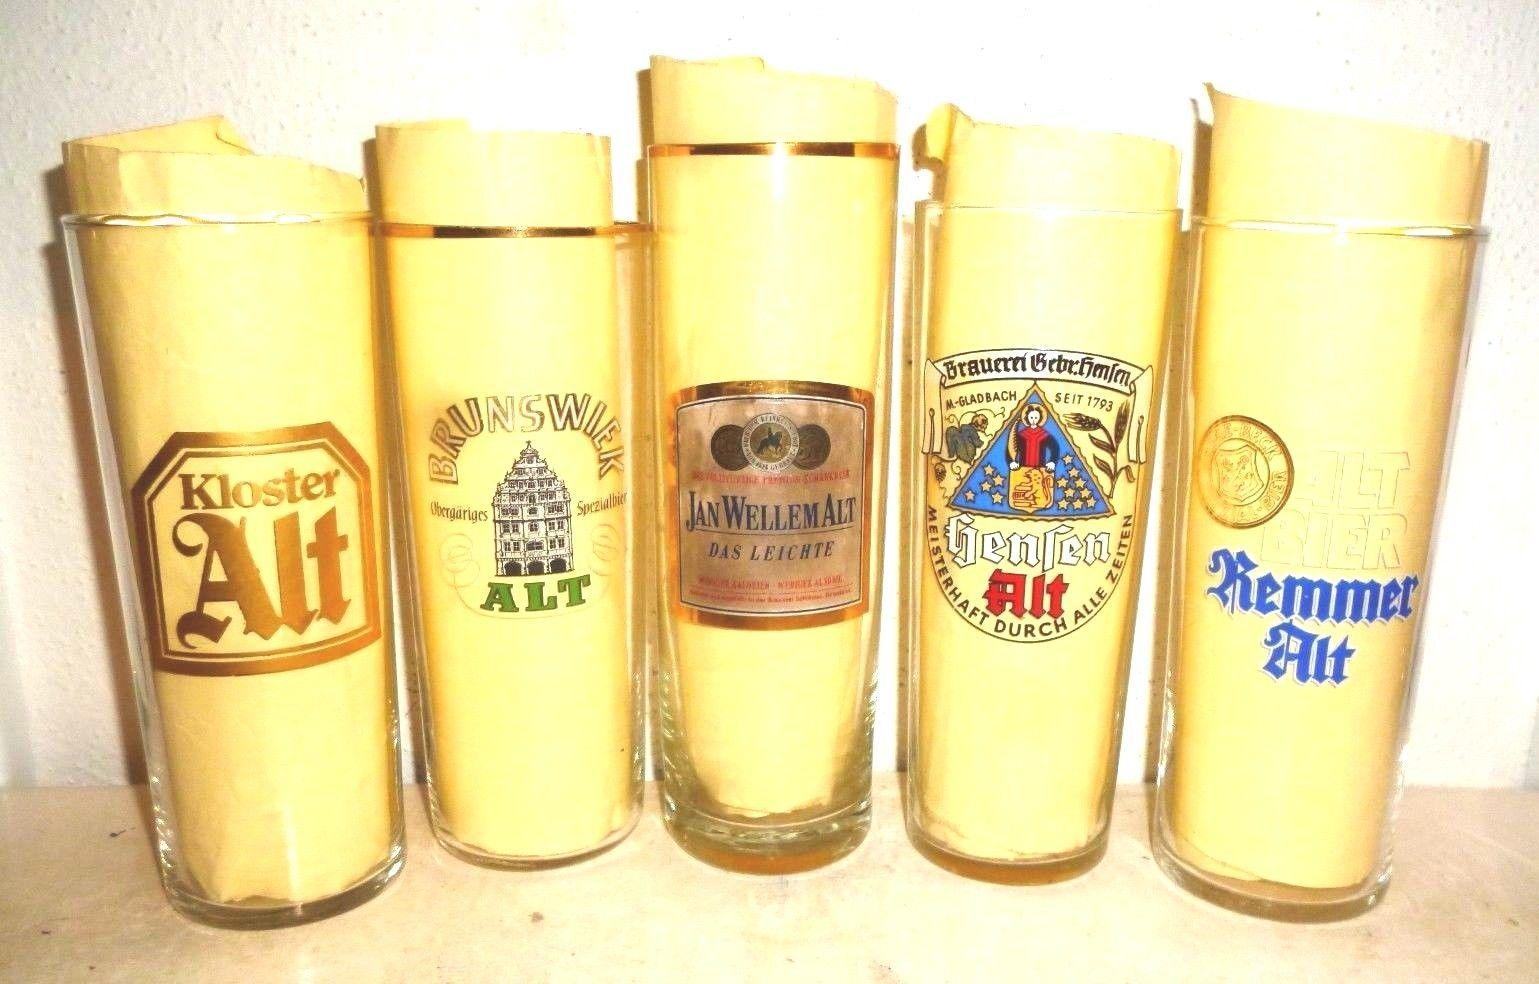 5 Kloster Brunswiek Wellem Hensen Remmert Altbier German Beer Glasses